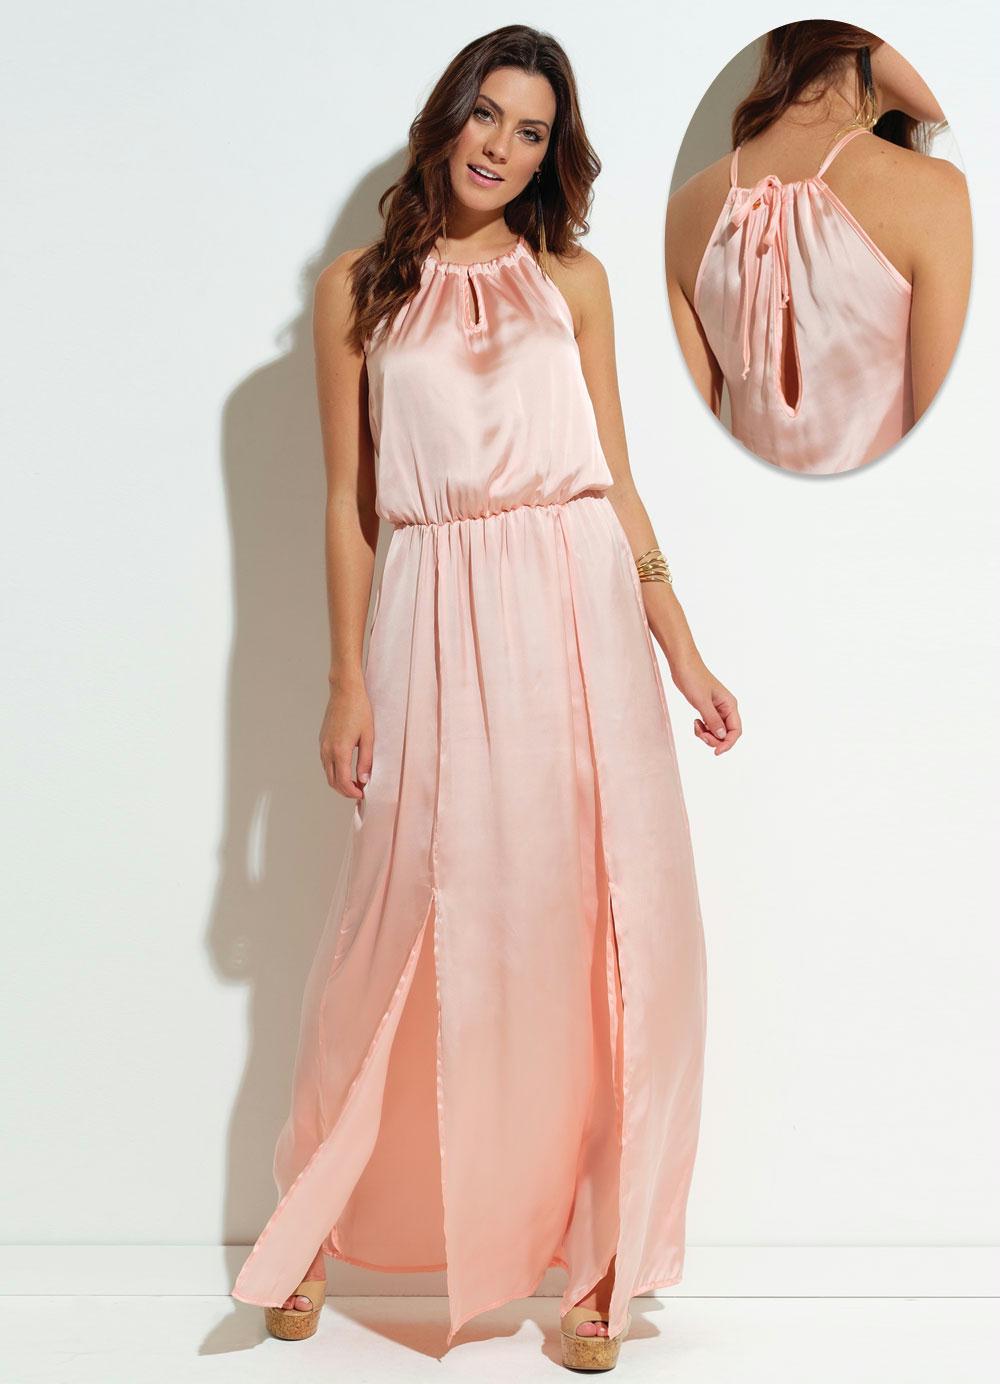 2dd3b2f08 Vestido Quintess em Chiffon Satin Rosa com Fenda - Quintess Outlet